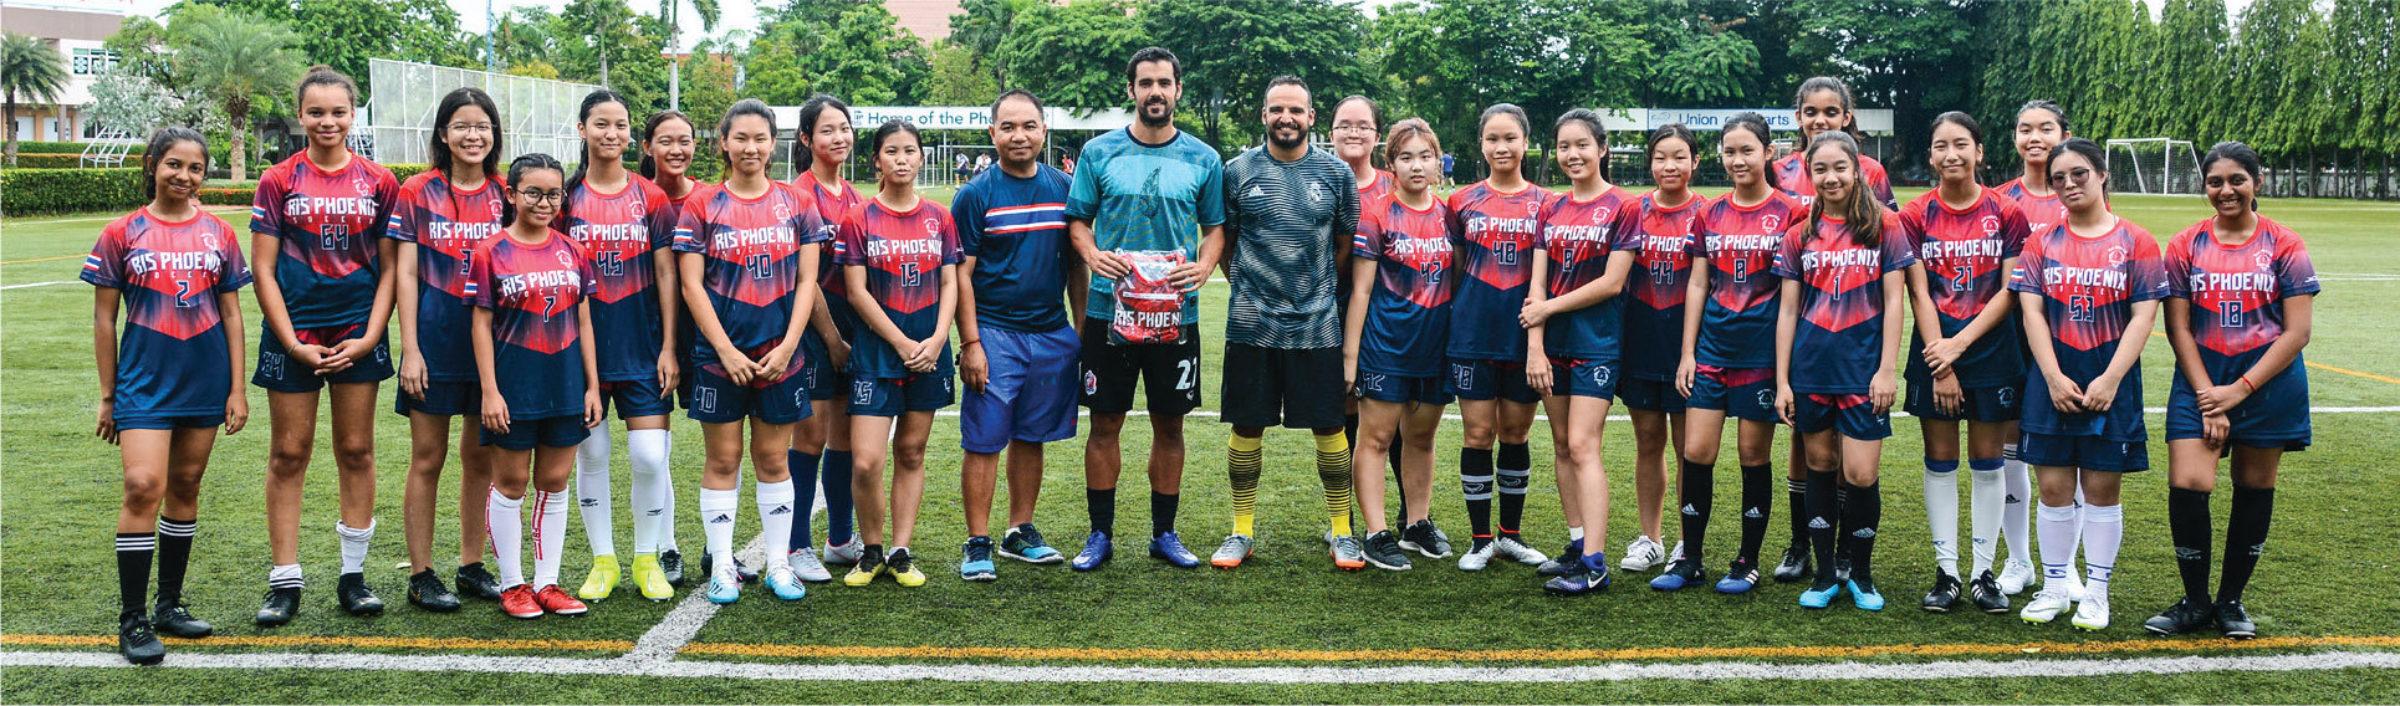 David Rochela: Professional Footballer Visits RIS!